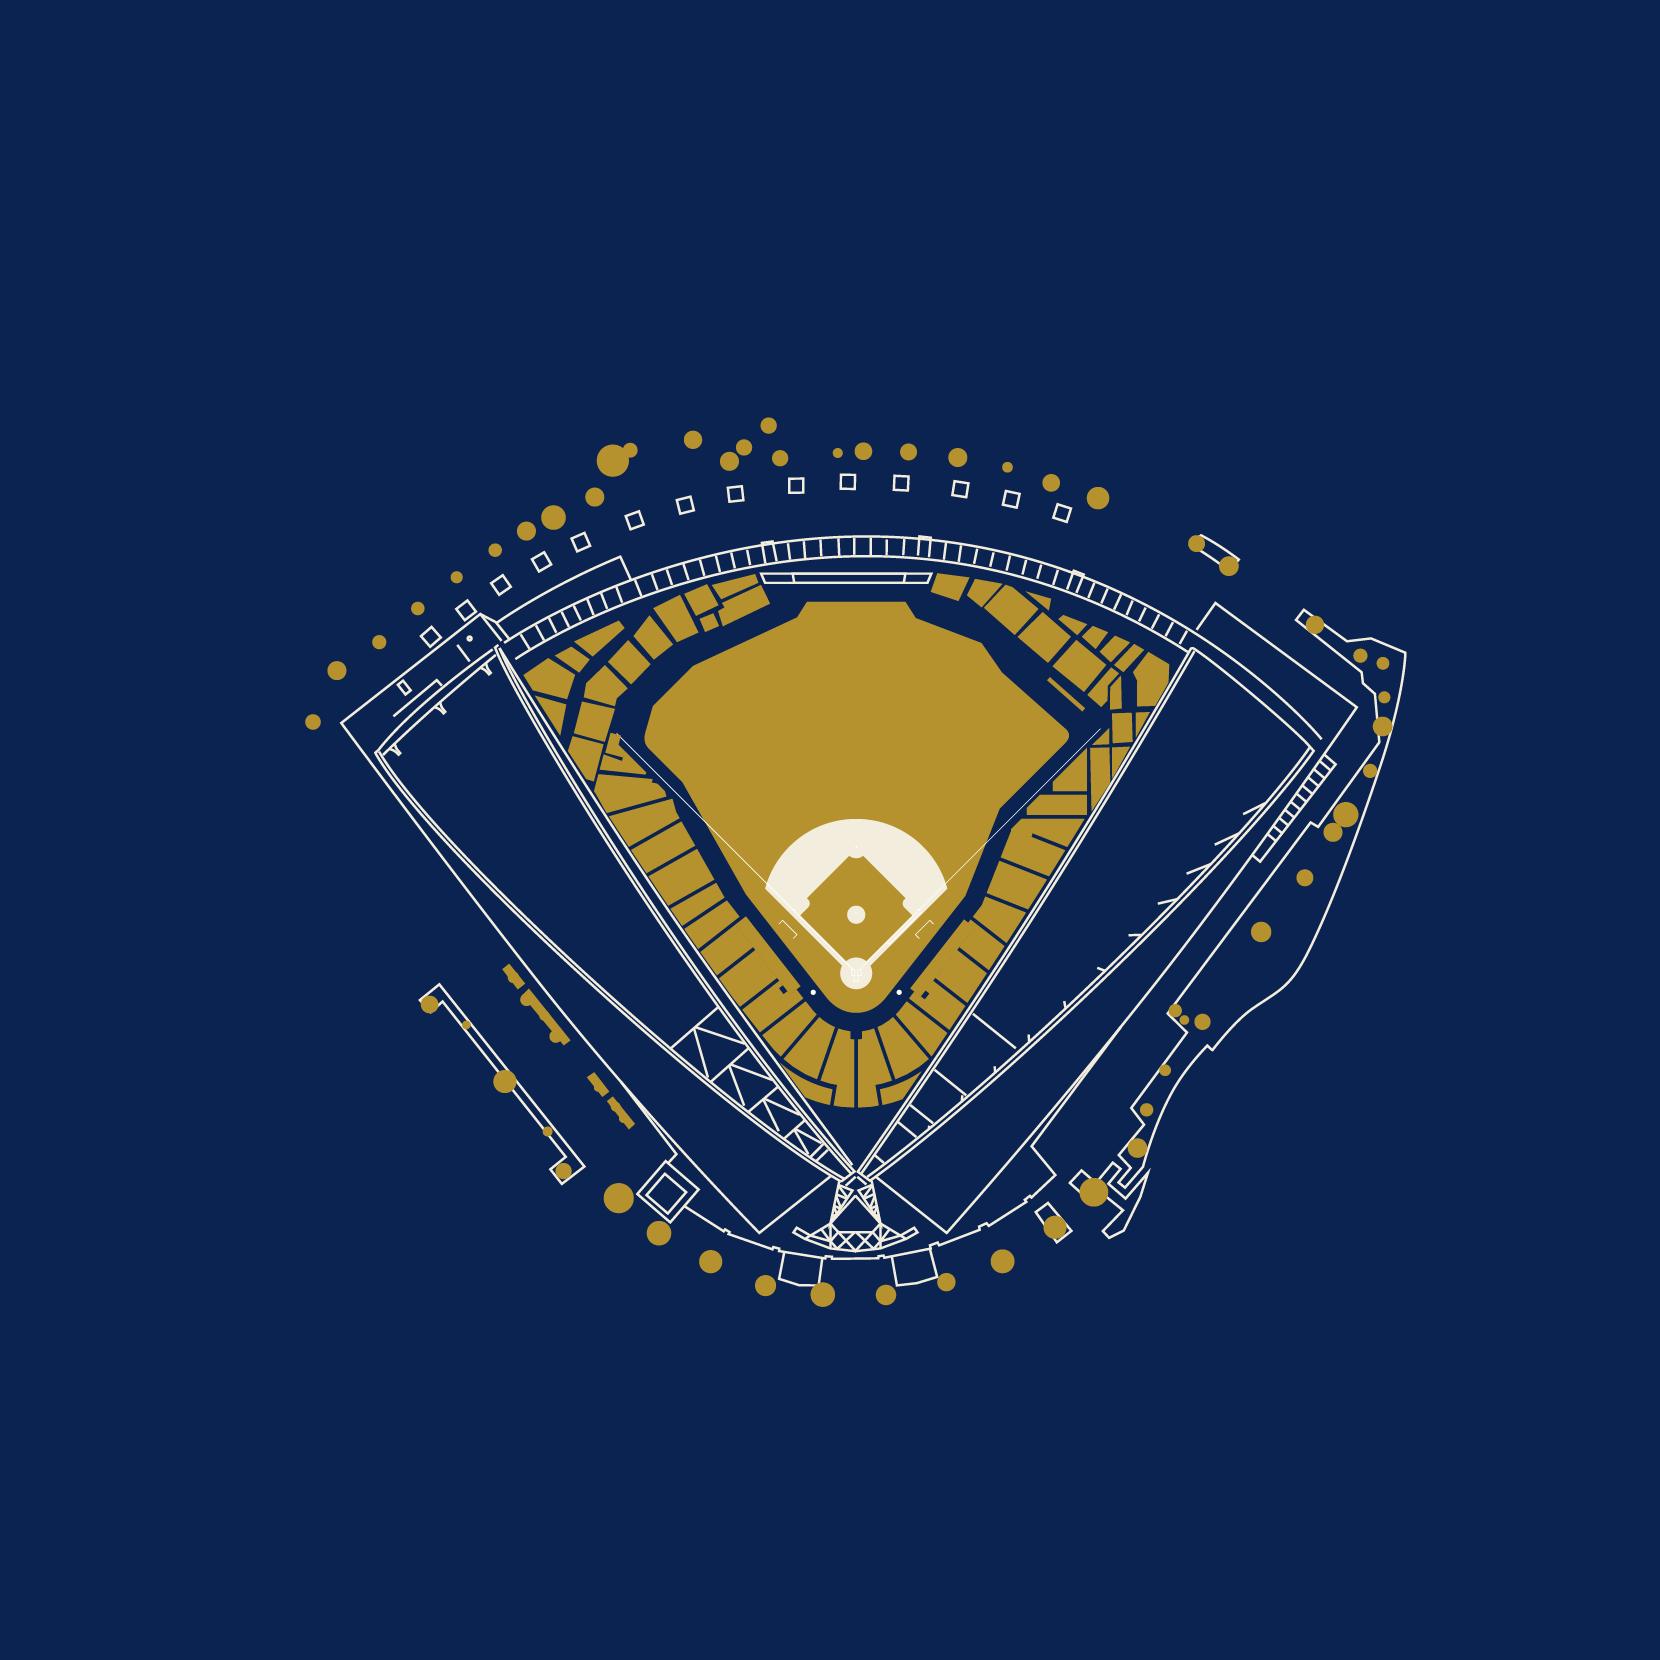 13 Miller Park Milwaukee Brewers.png